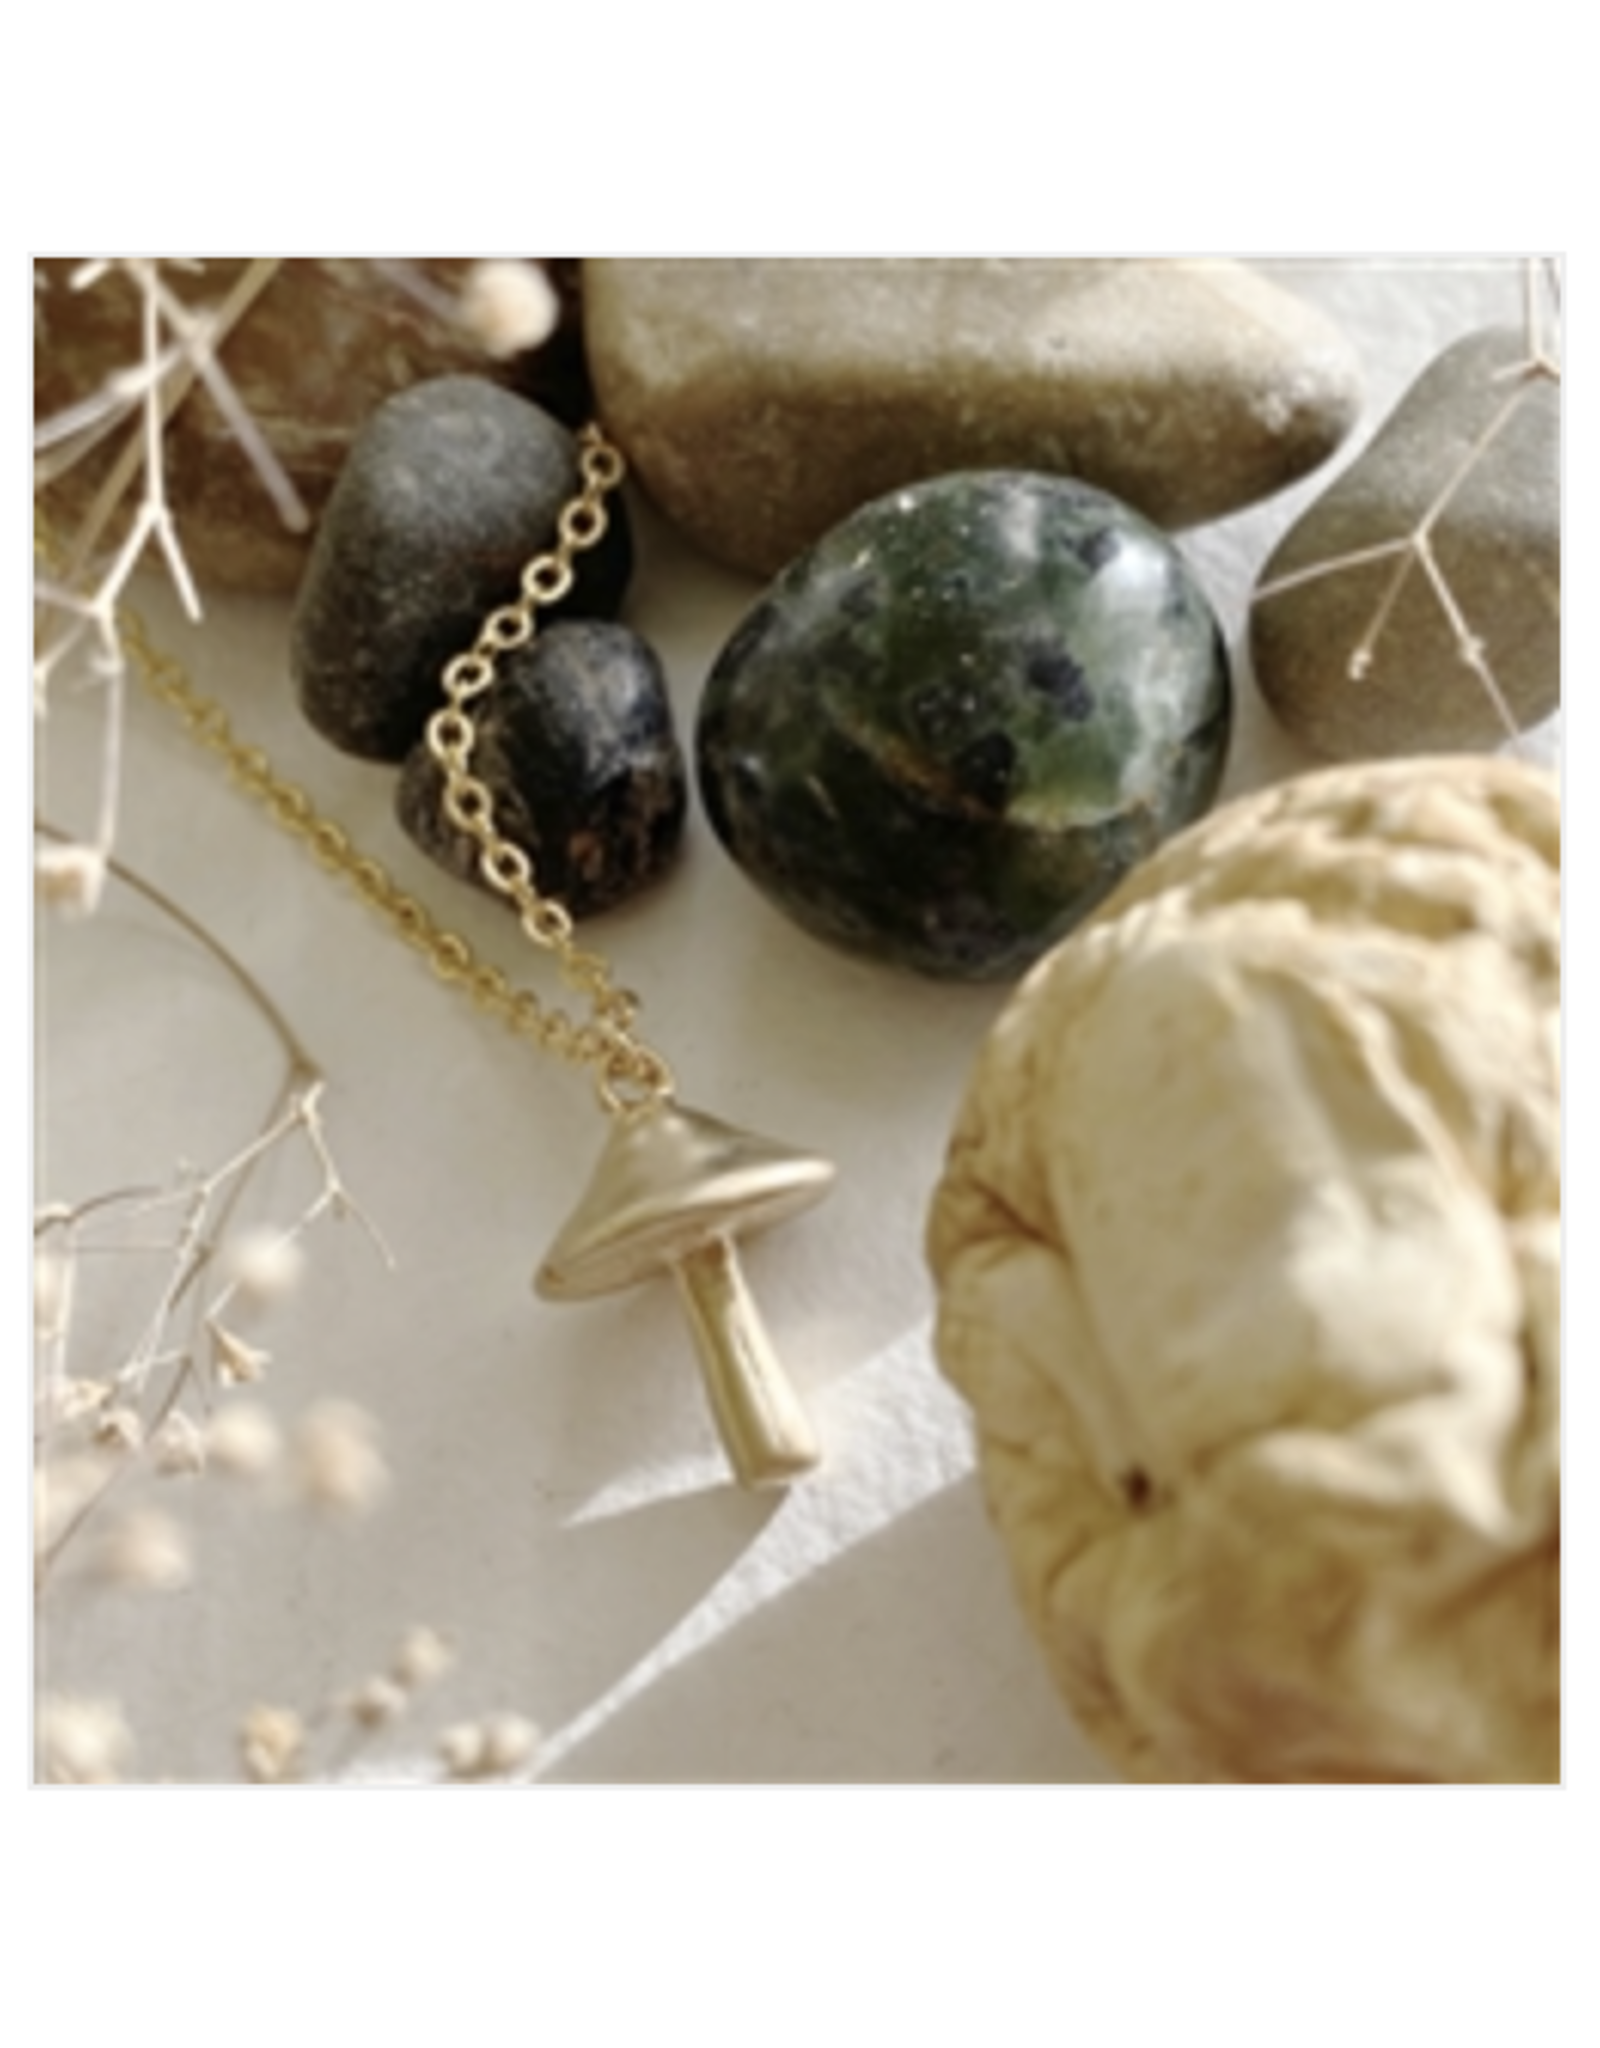 Cubensis Mushroom Charm Necklace - Gold